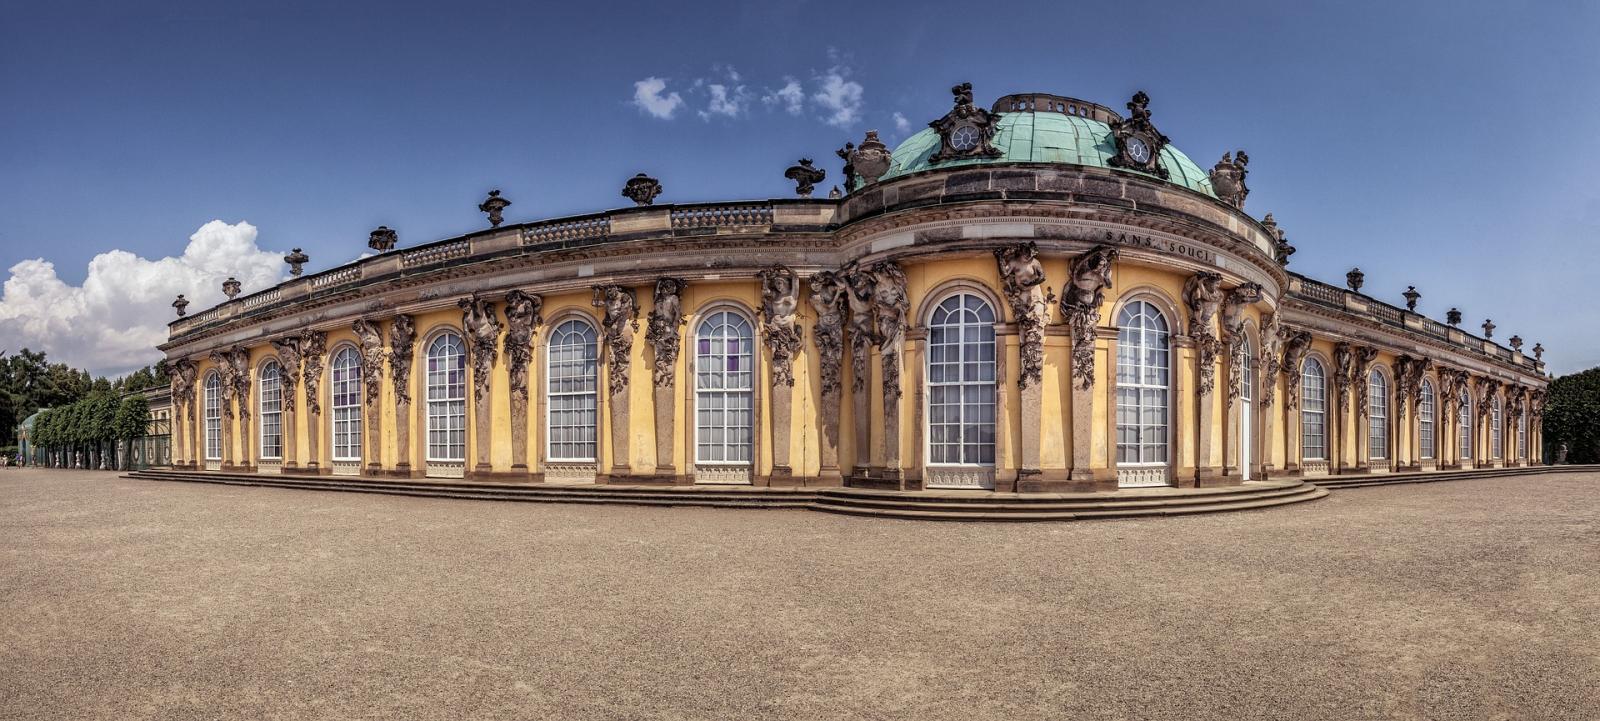 berlin-1494417_1920